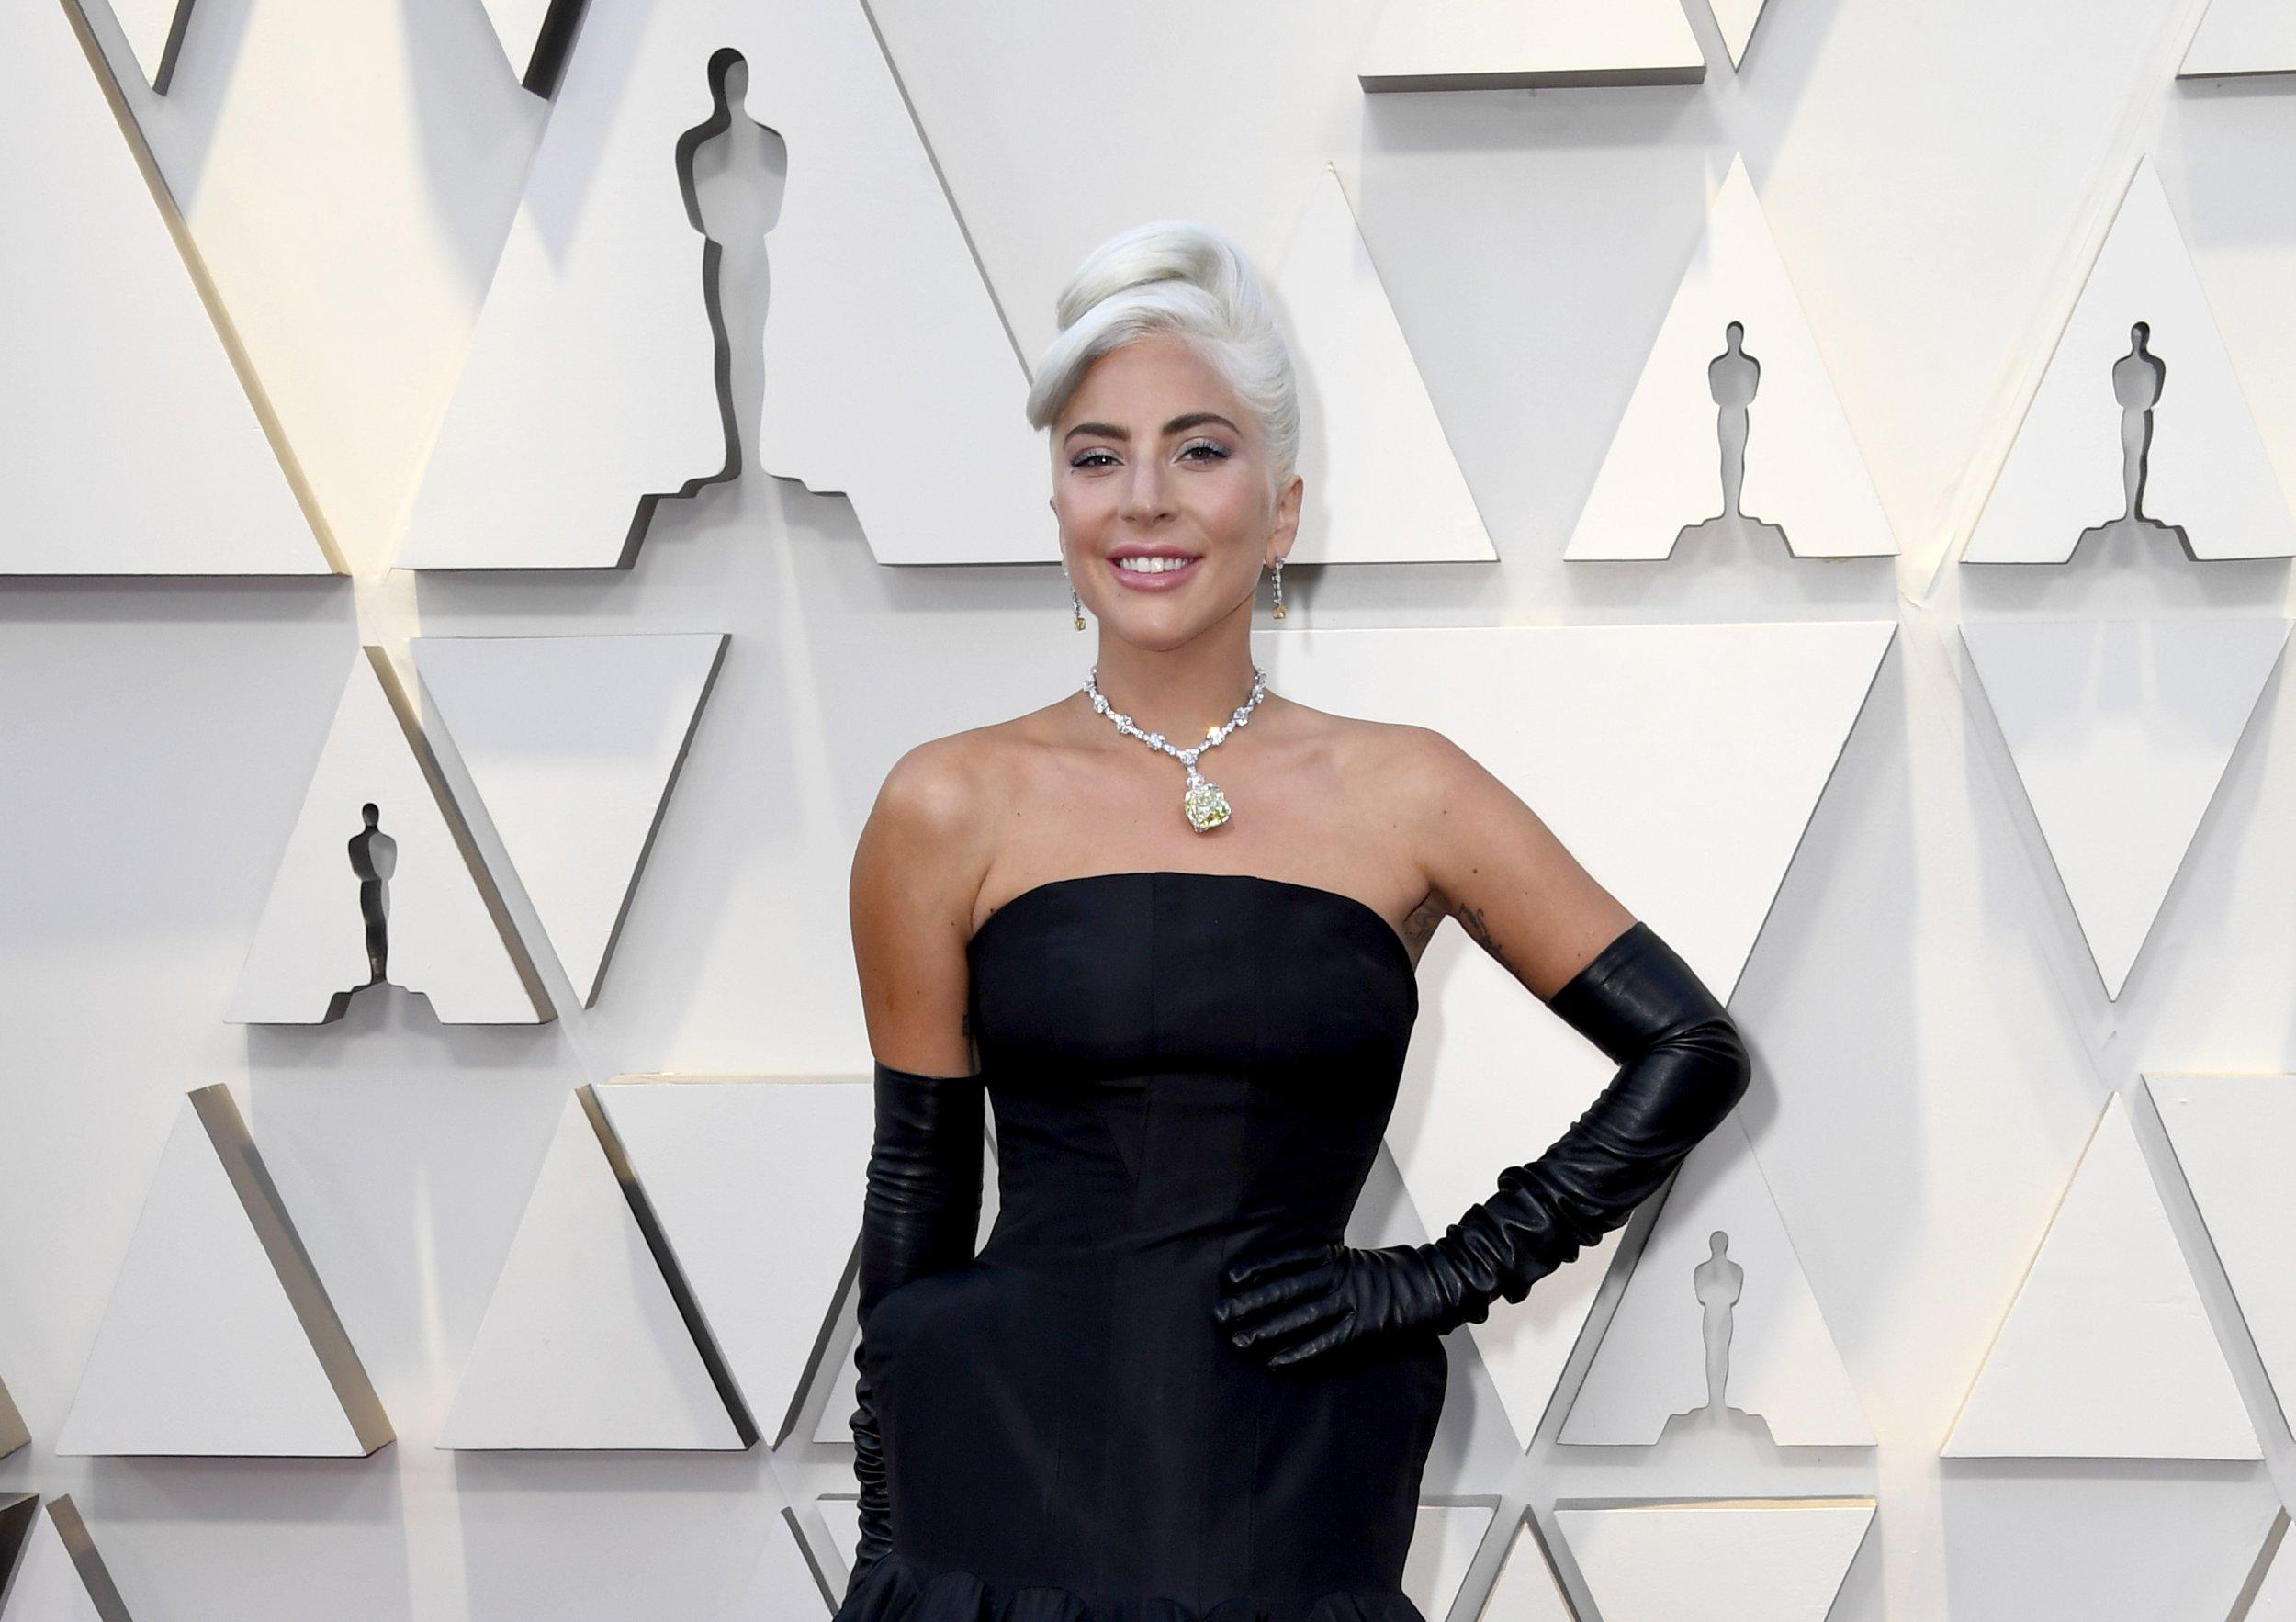 Lady Gaga's Oscars Necklace Was Last Worn By Audrey Hepburn